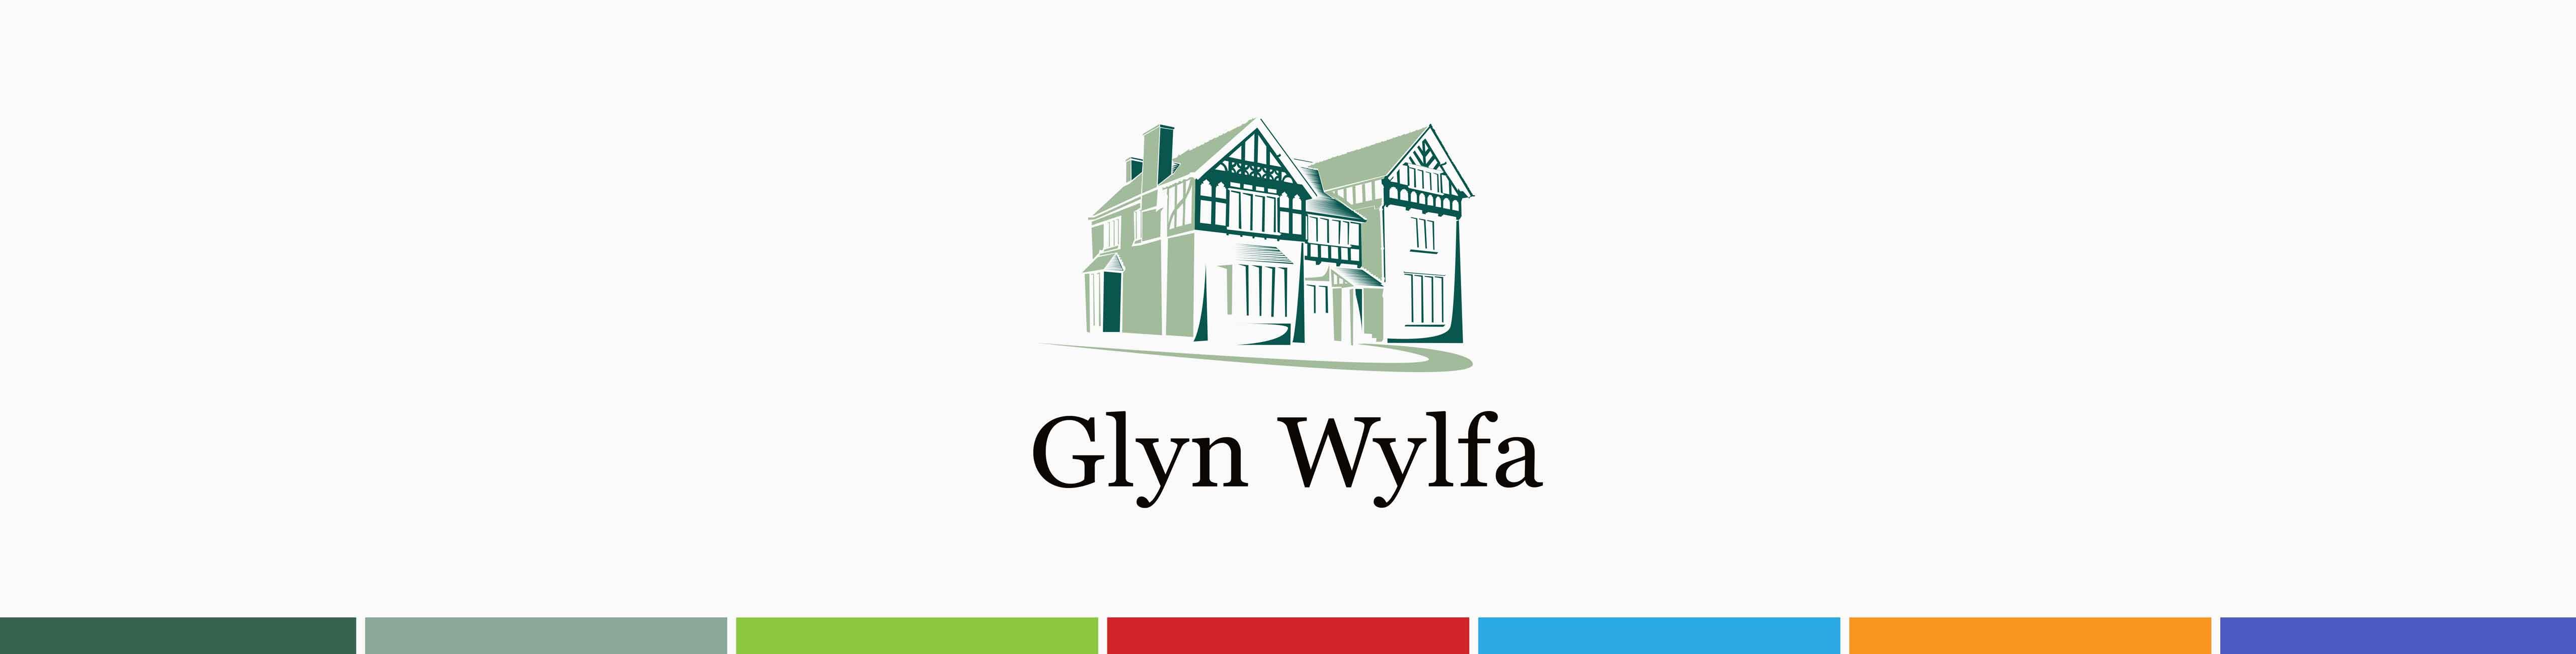 Glyn Wylfa Branding